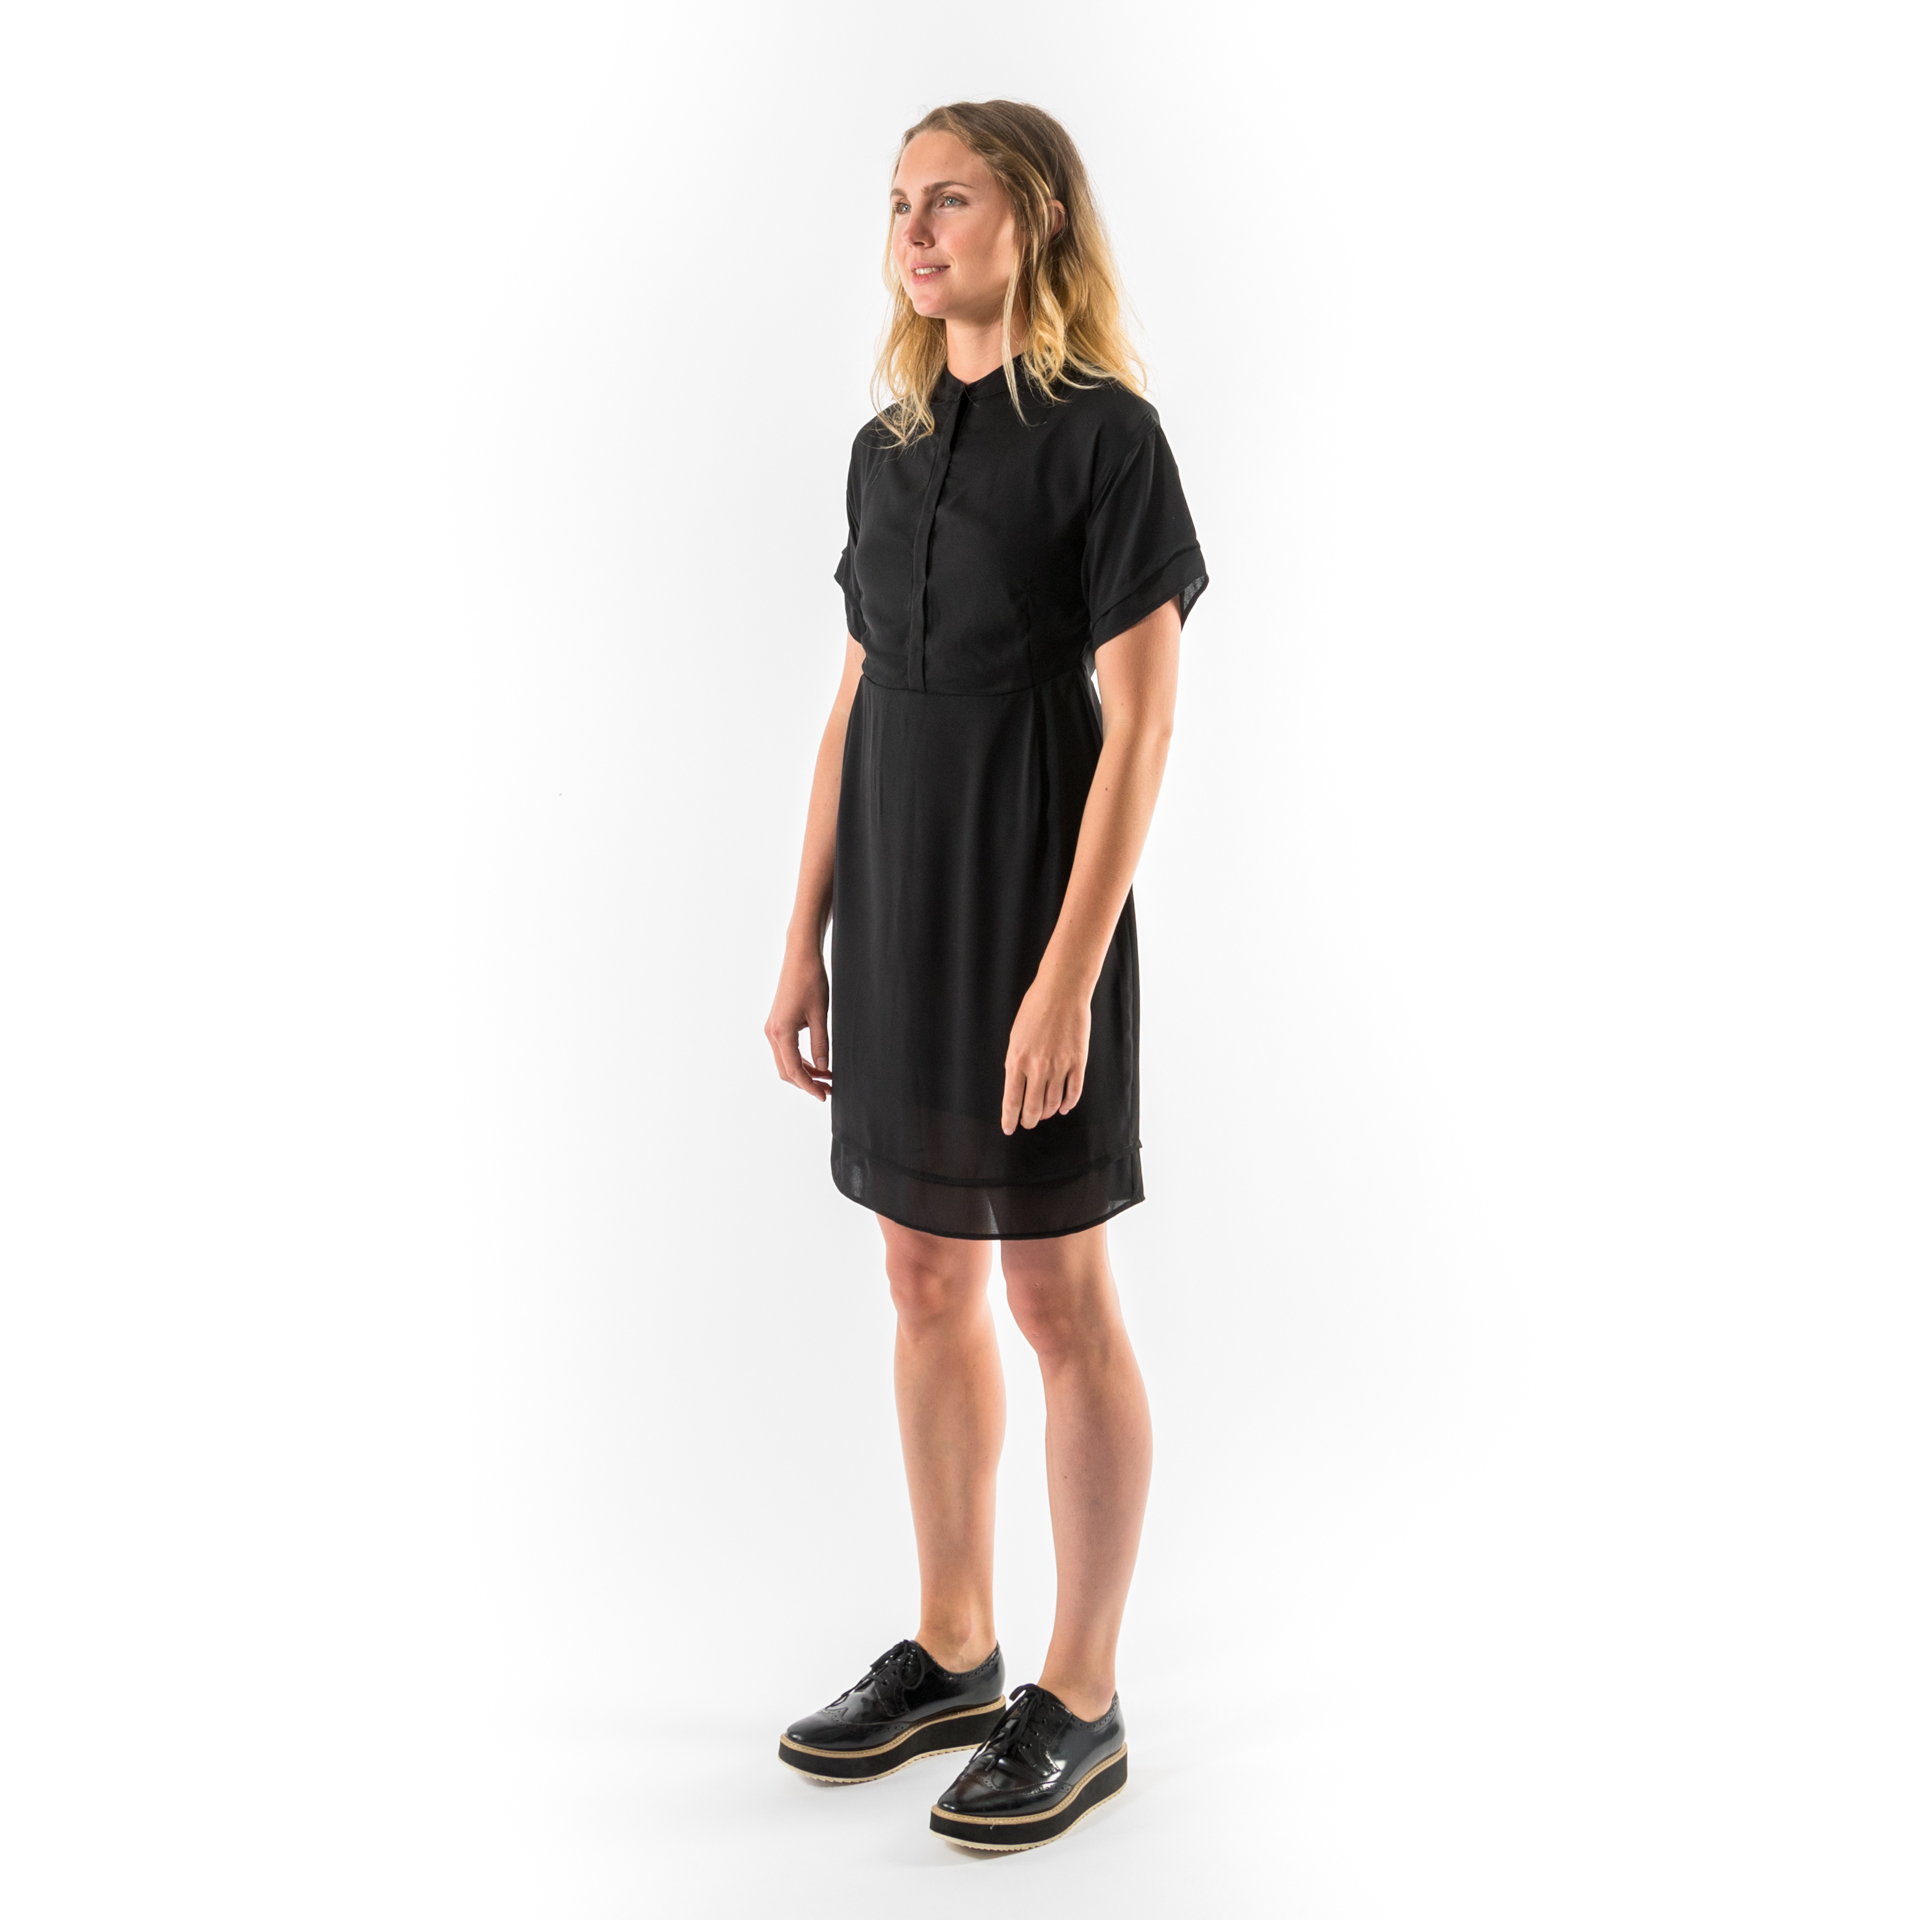 Kim Sassen Clothing George Dress Black Front Side